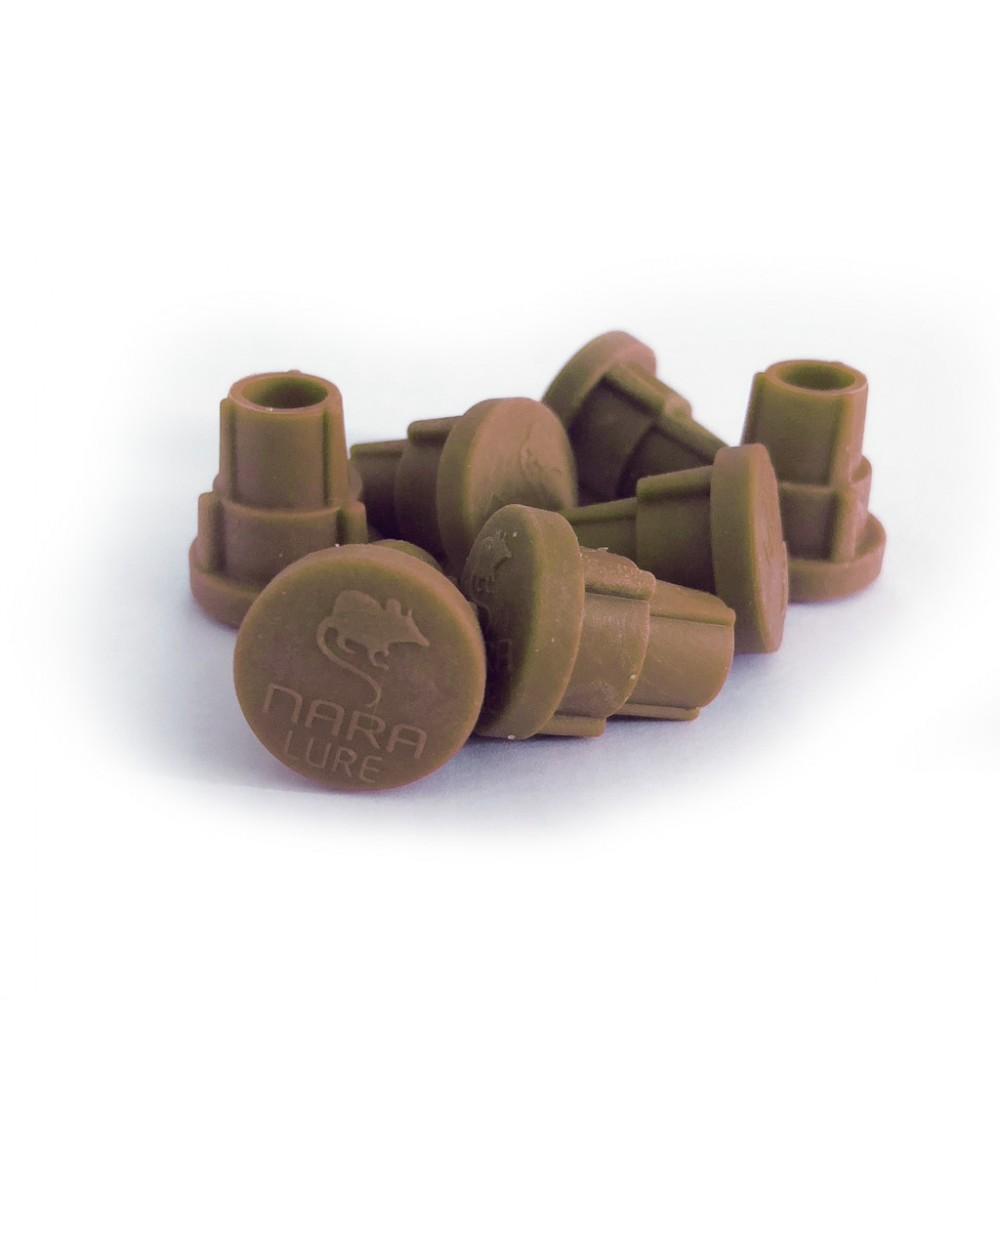 NARA LURE CHOCOLAT NOISETTE LOT 100 UNITES